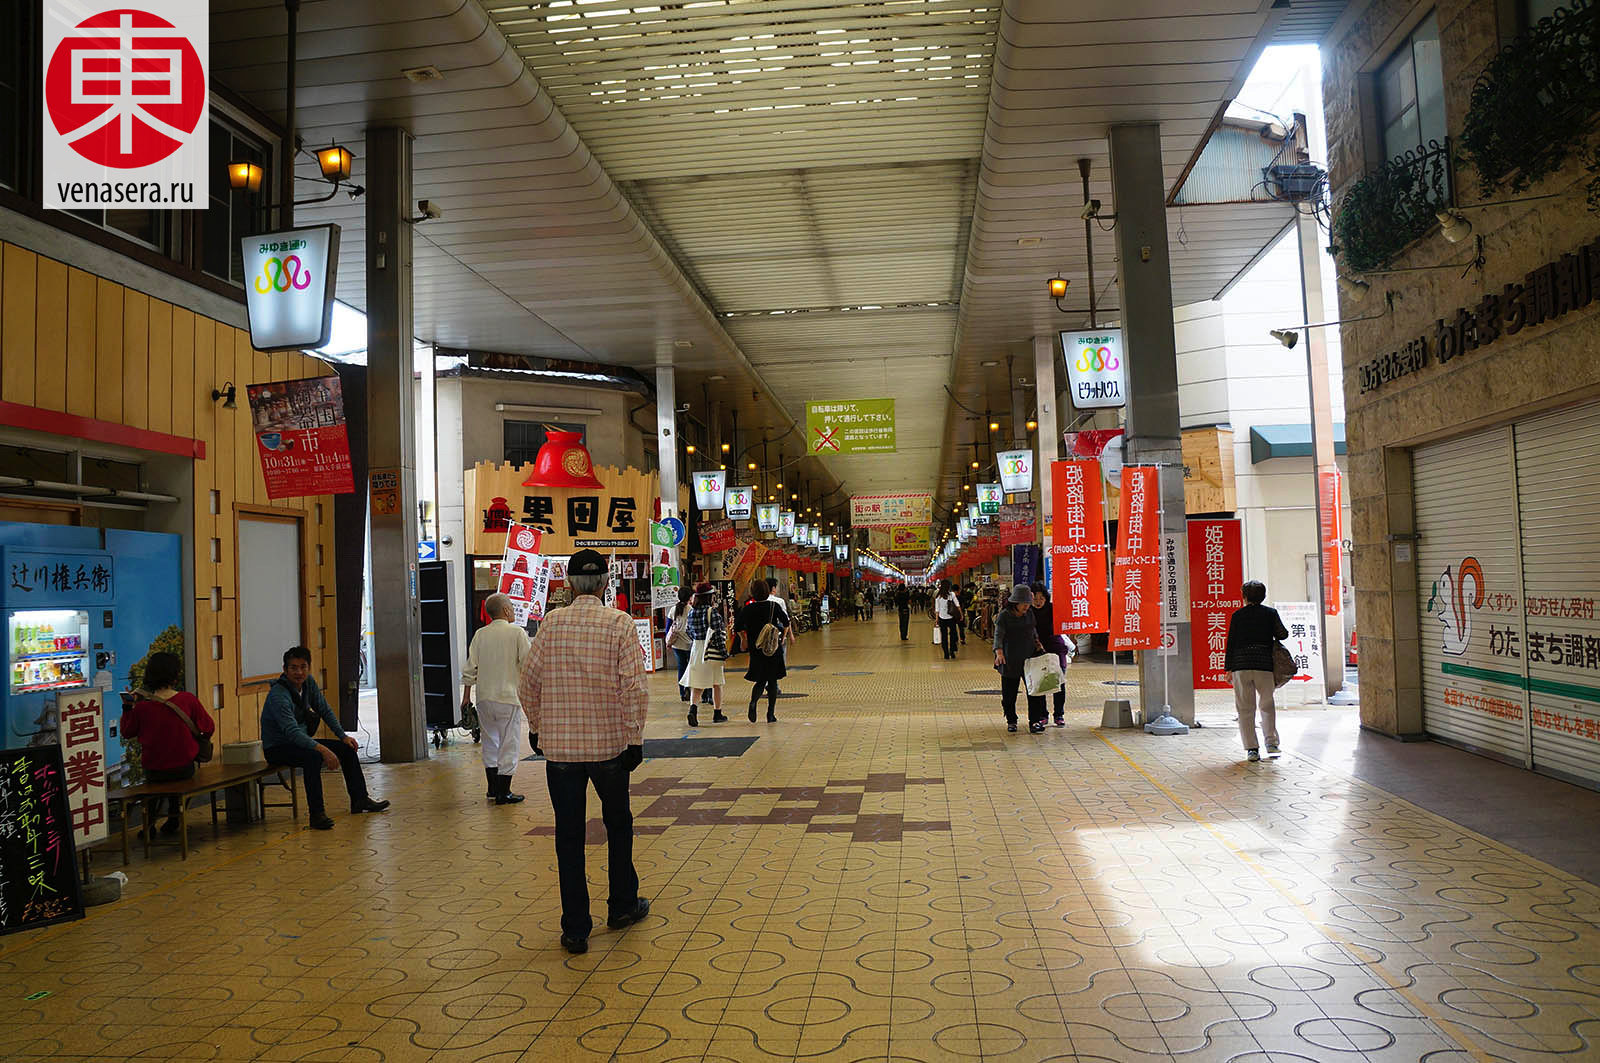 Химэдзи, Himeji, 姫路, Хёго, Hyogo, 兵庫県, Хонсю, Honshu, 本州, Япония, Japan, 日本.